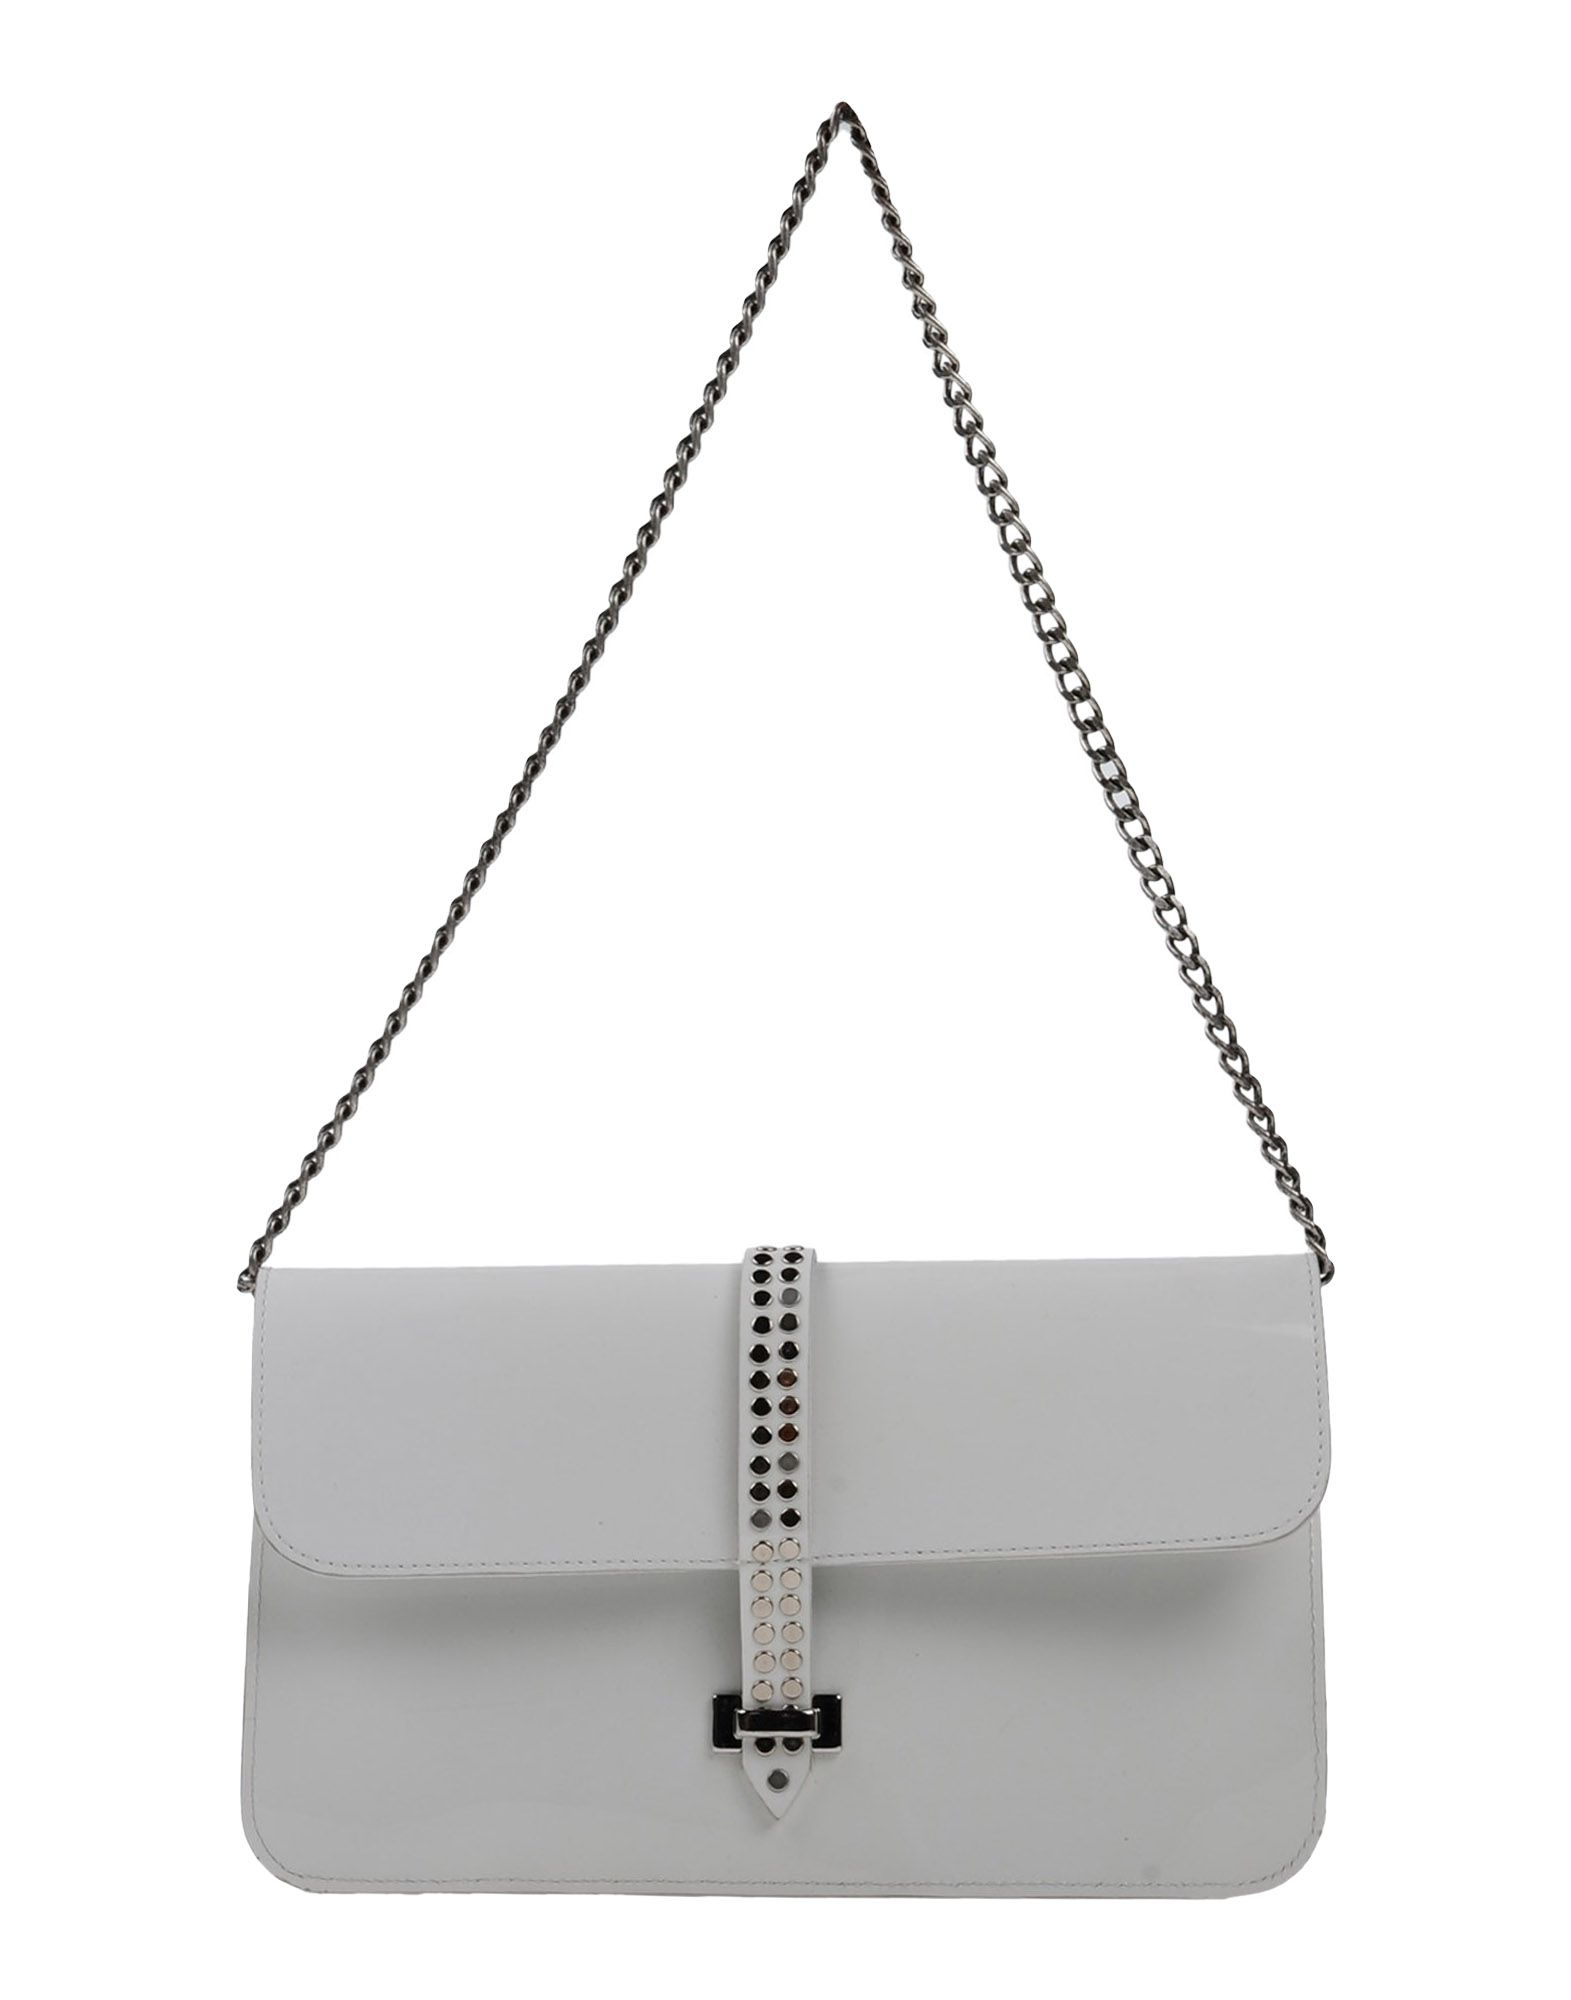 NANNI Shoulder Bag in White